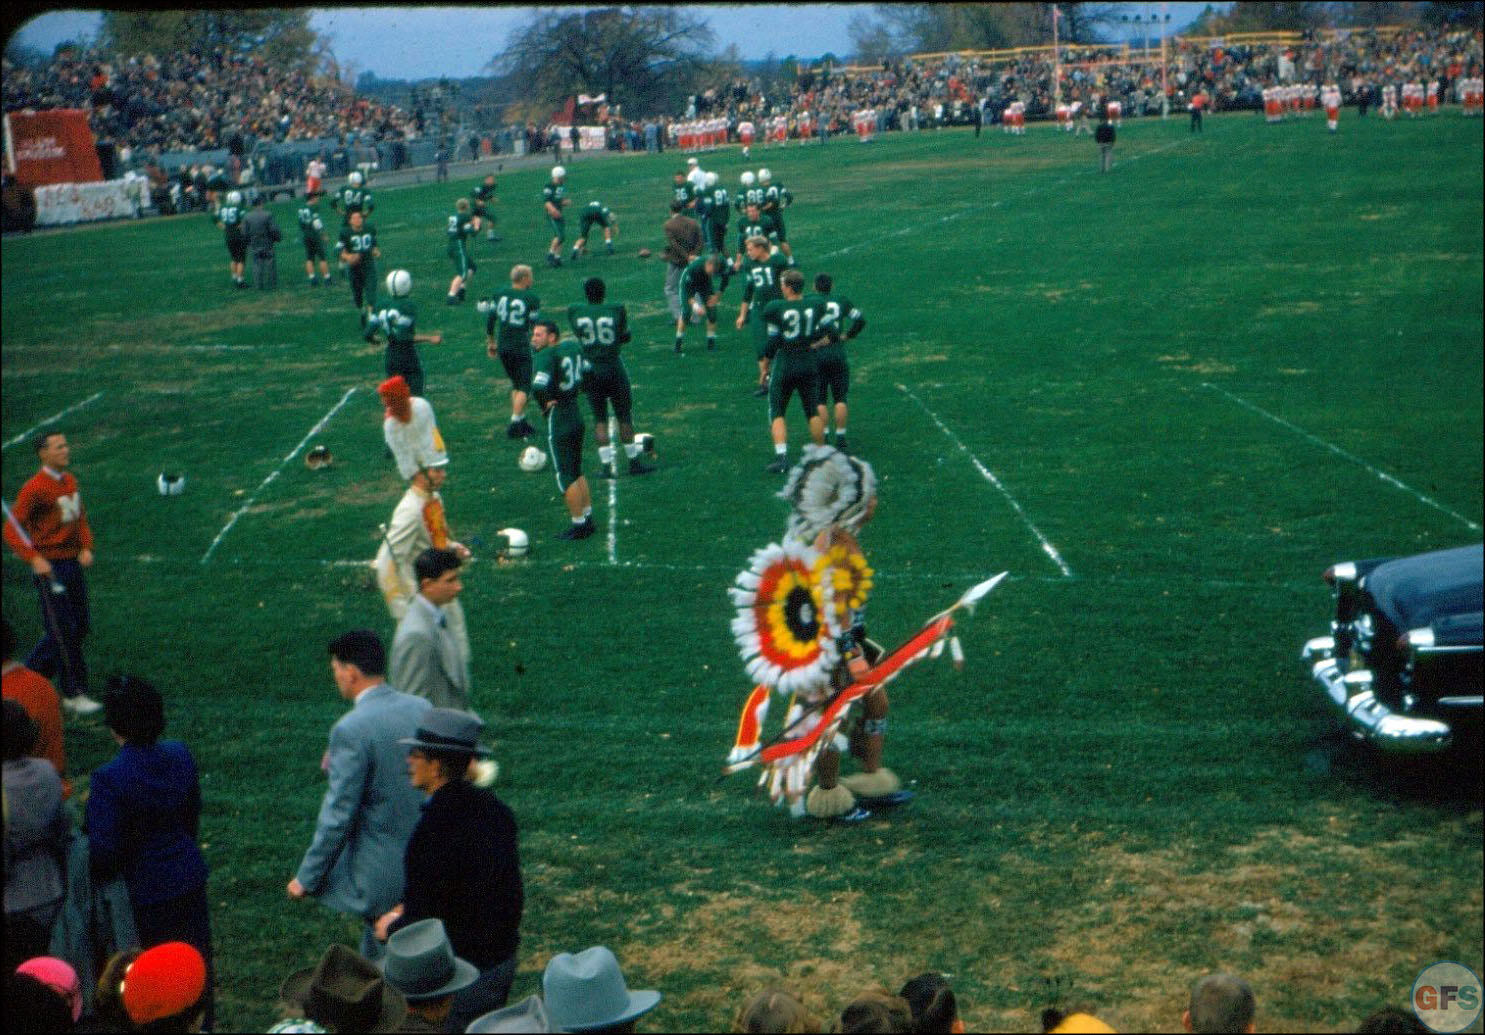 Miami University (OH) Homecoming, 1953